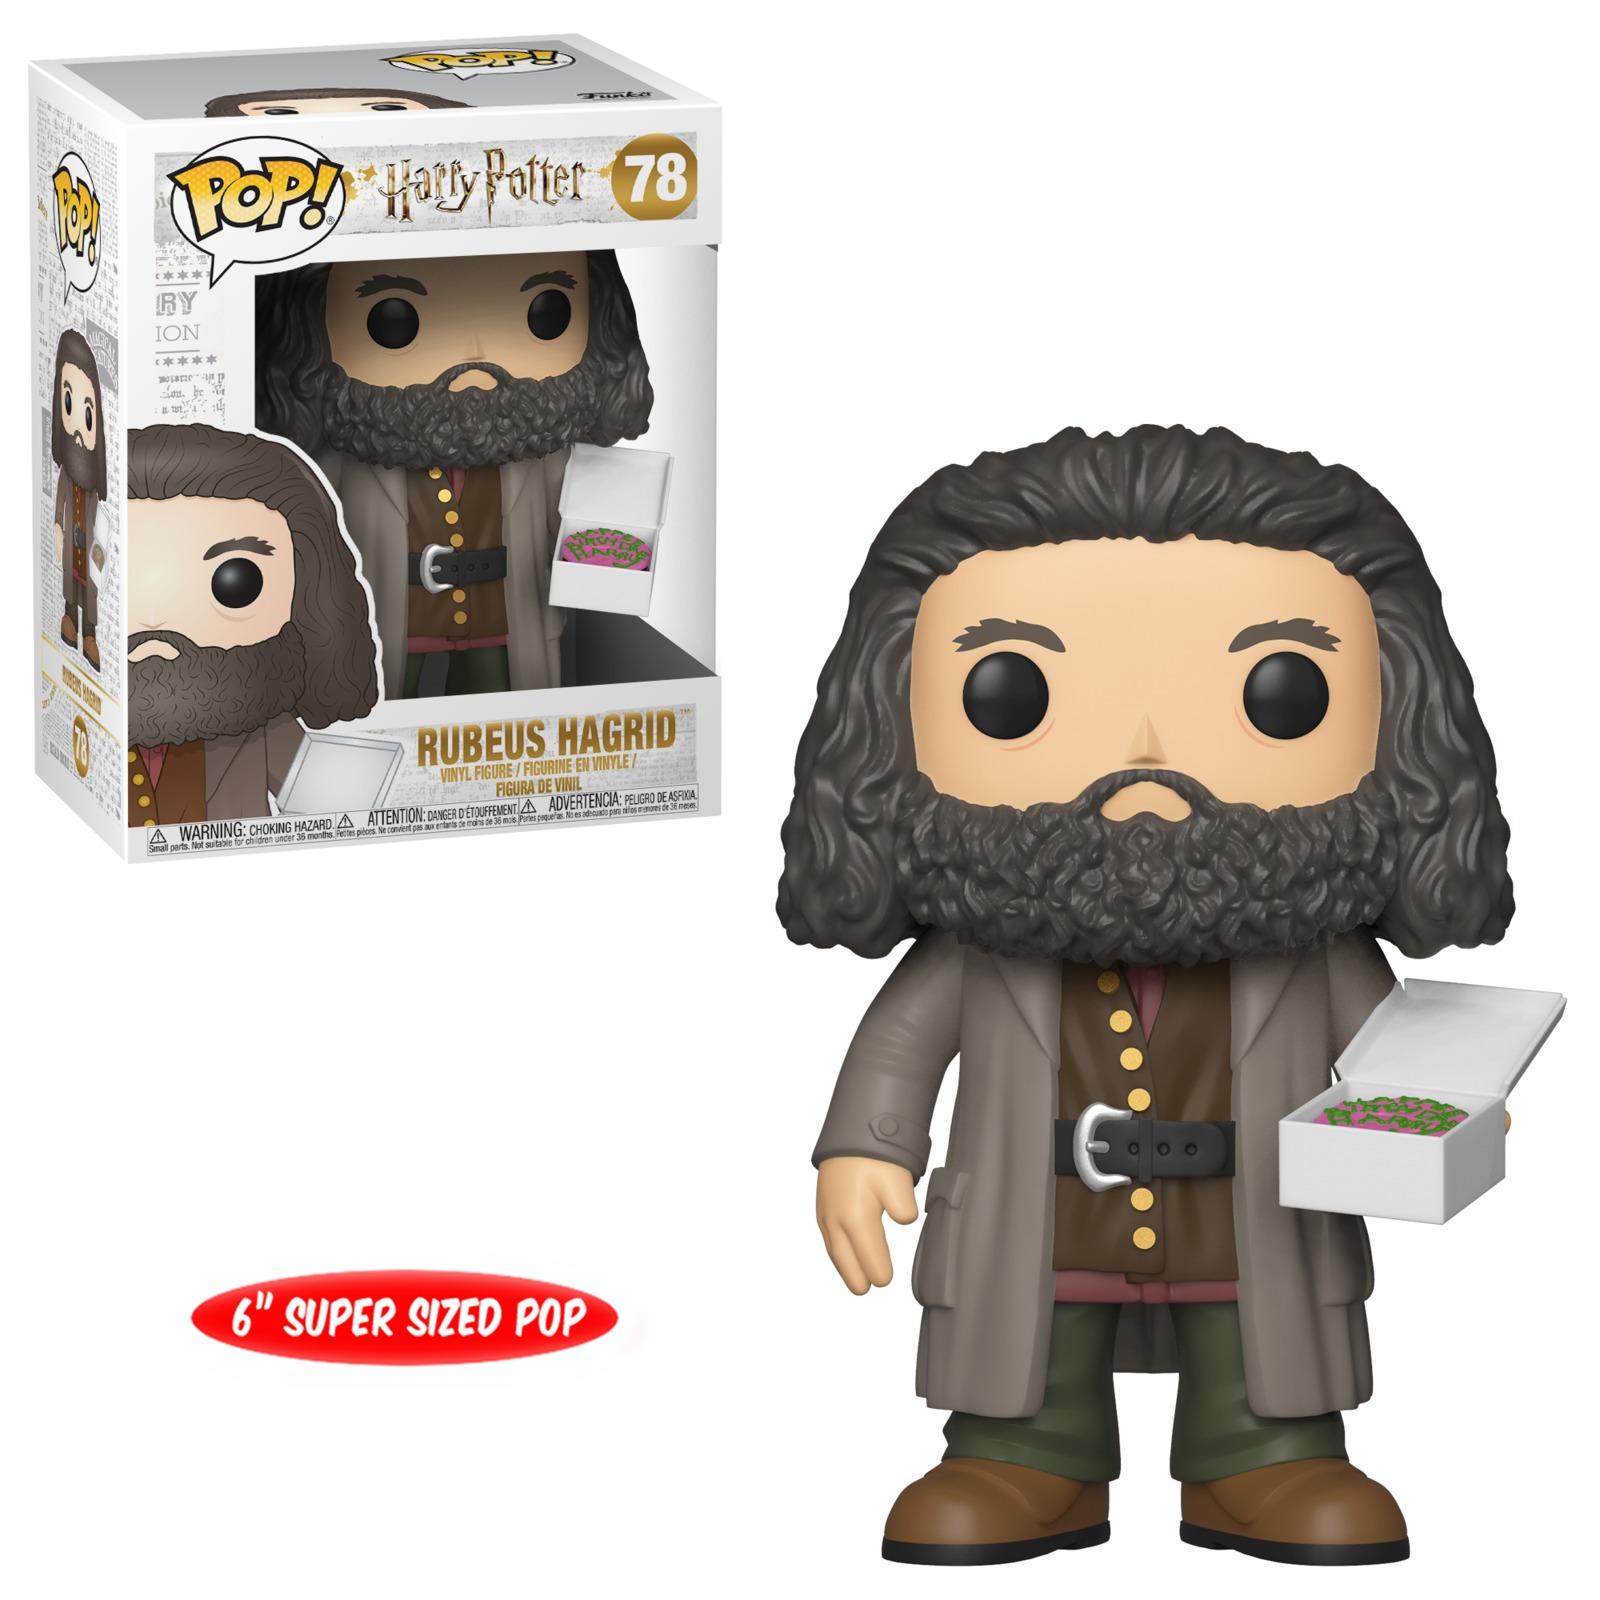 "Harry Potter - Hagrid (with Cake) 6"" Pop! Vinyl Figure image"